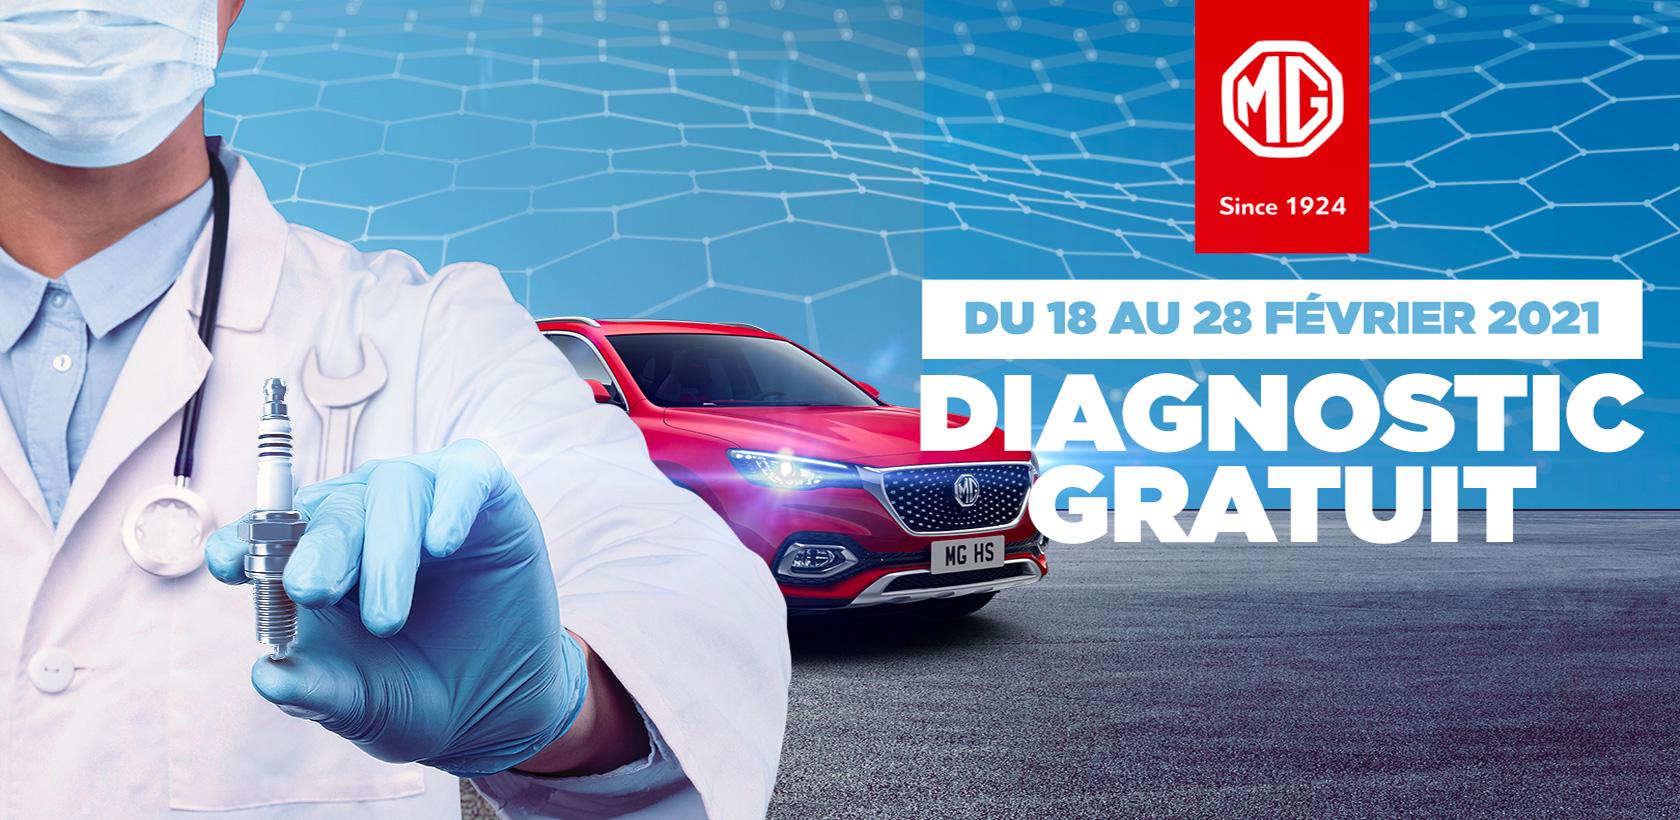 Diagnostic gratuit chez MG Motors